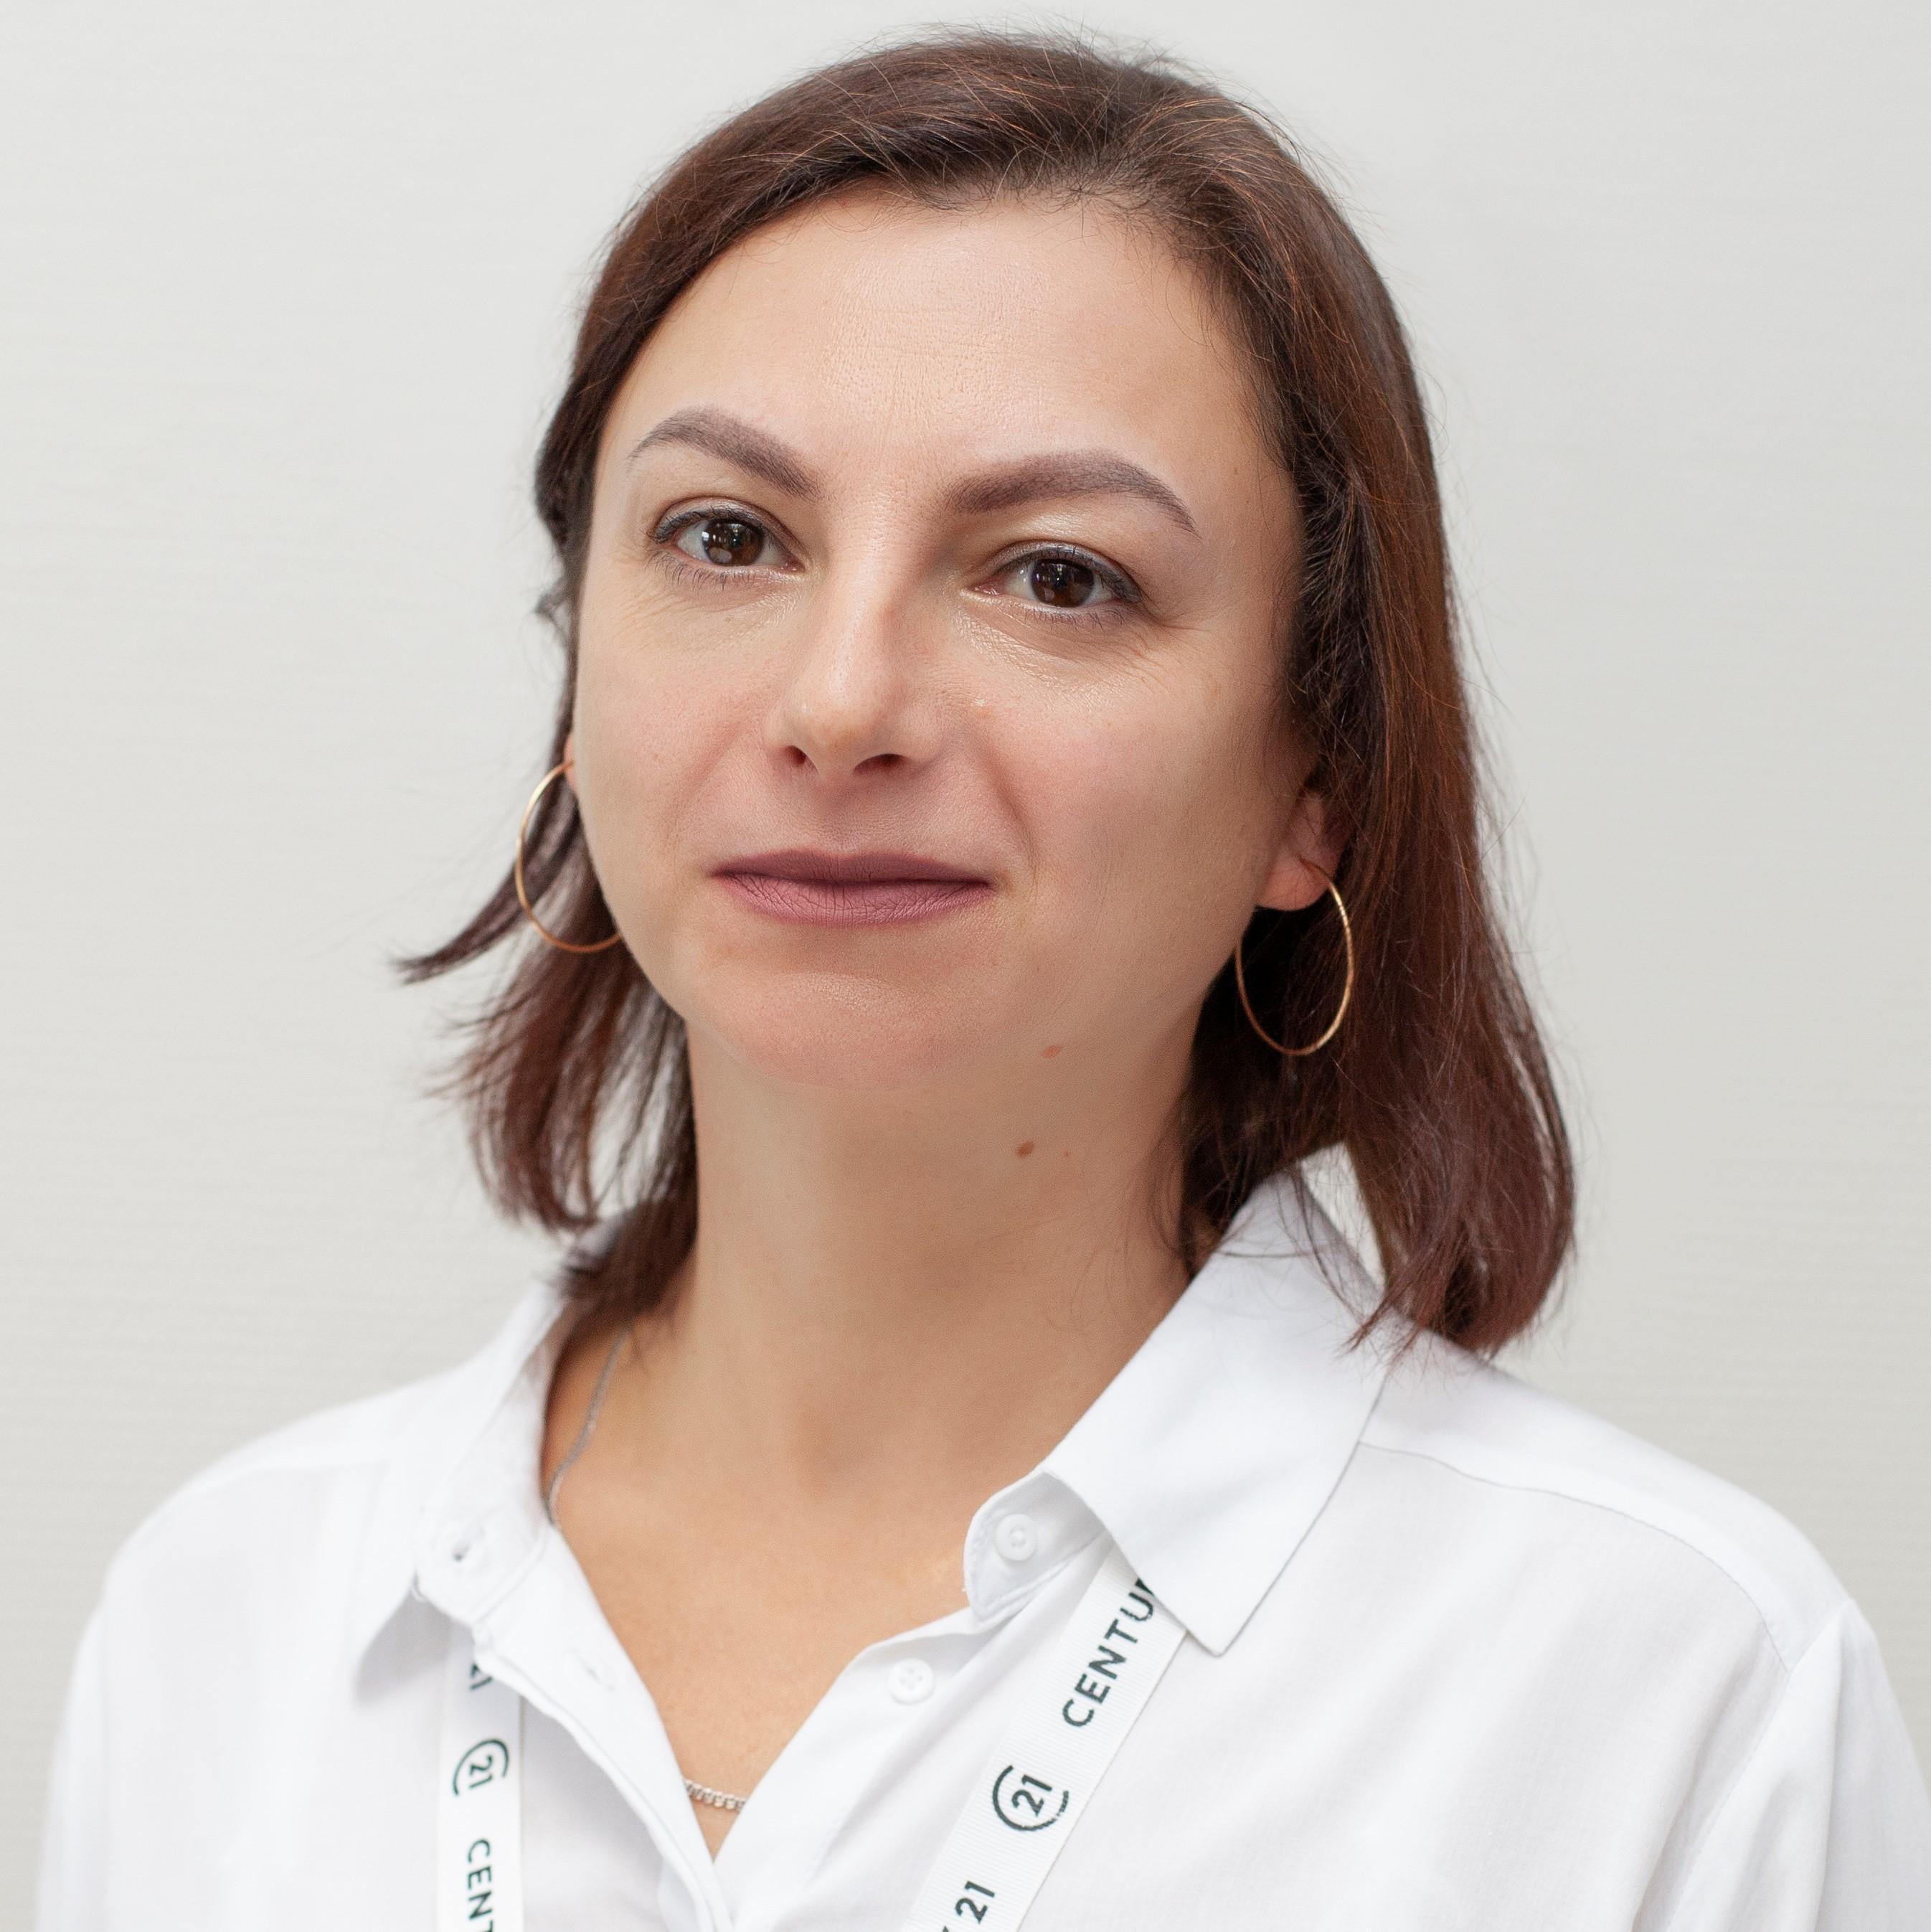 Ситдикова Ольга